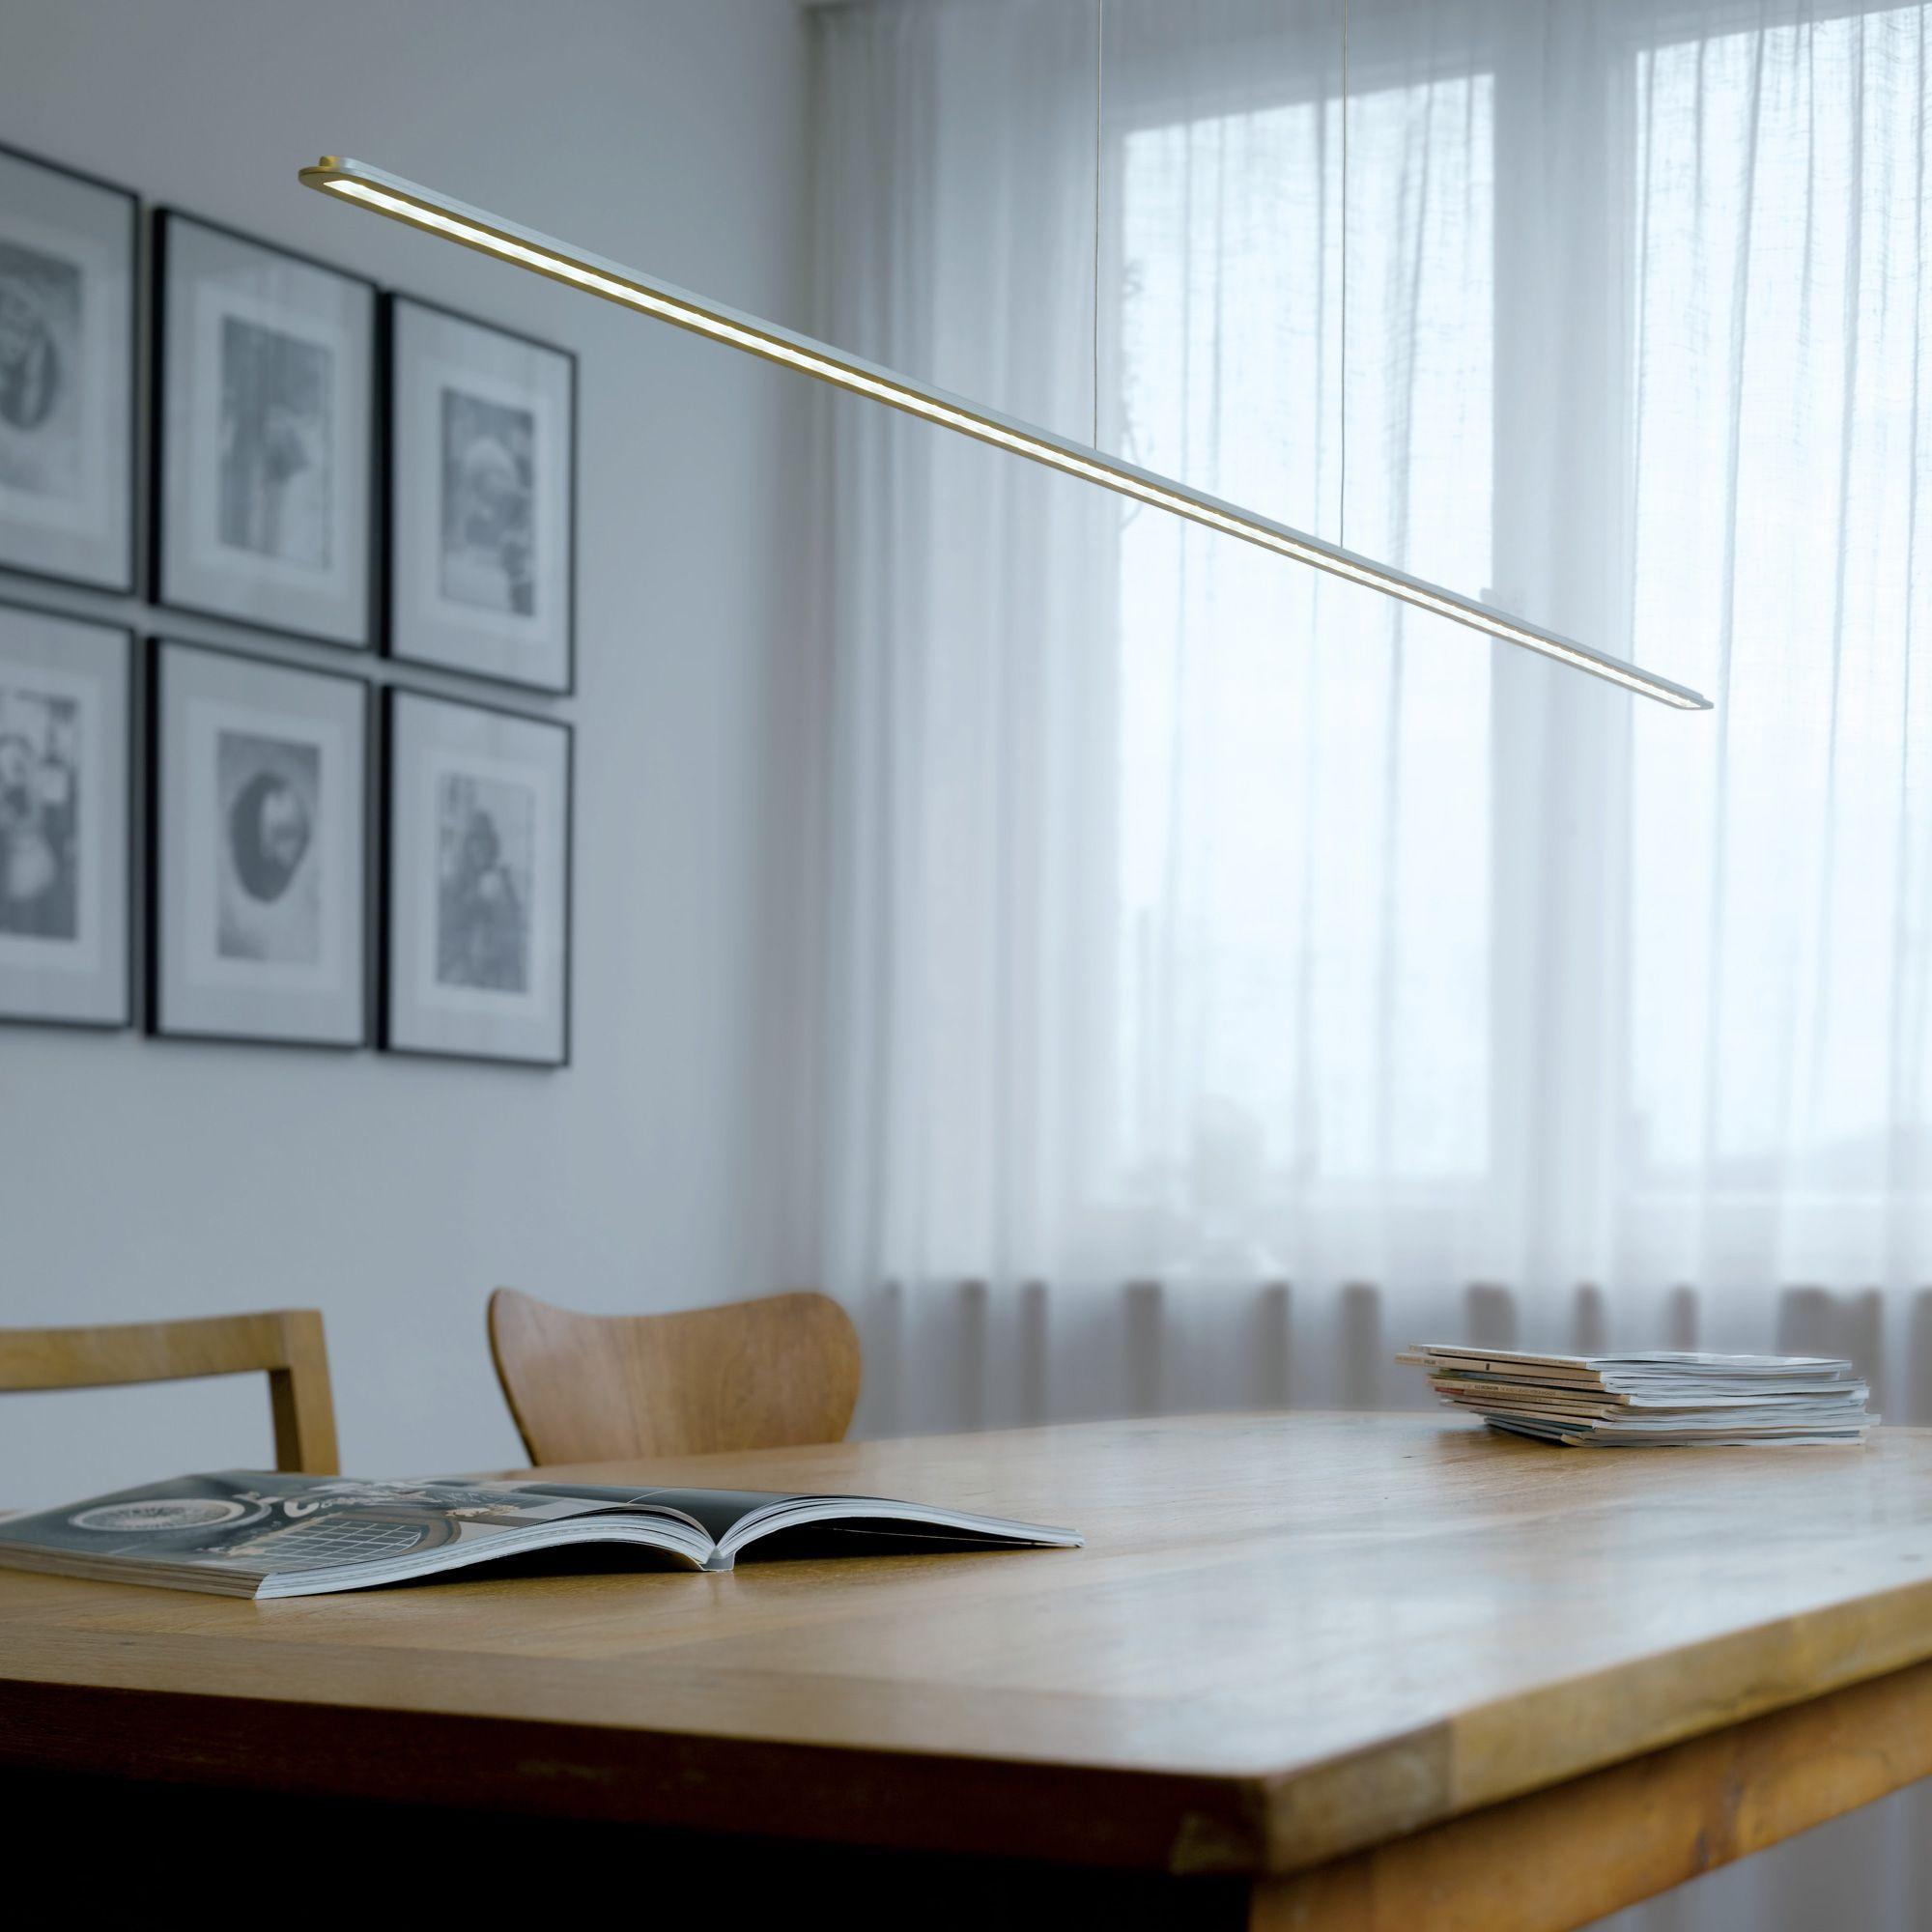 Steng Licht steng licht ledy pendant light led with touchdimmer 55ble